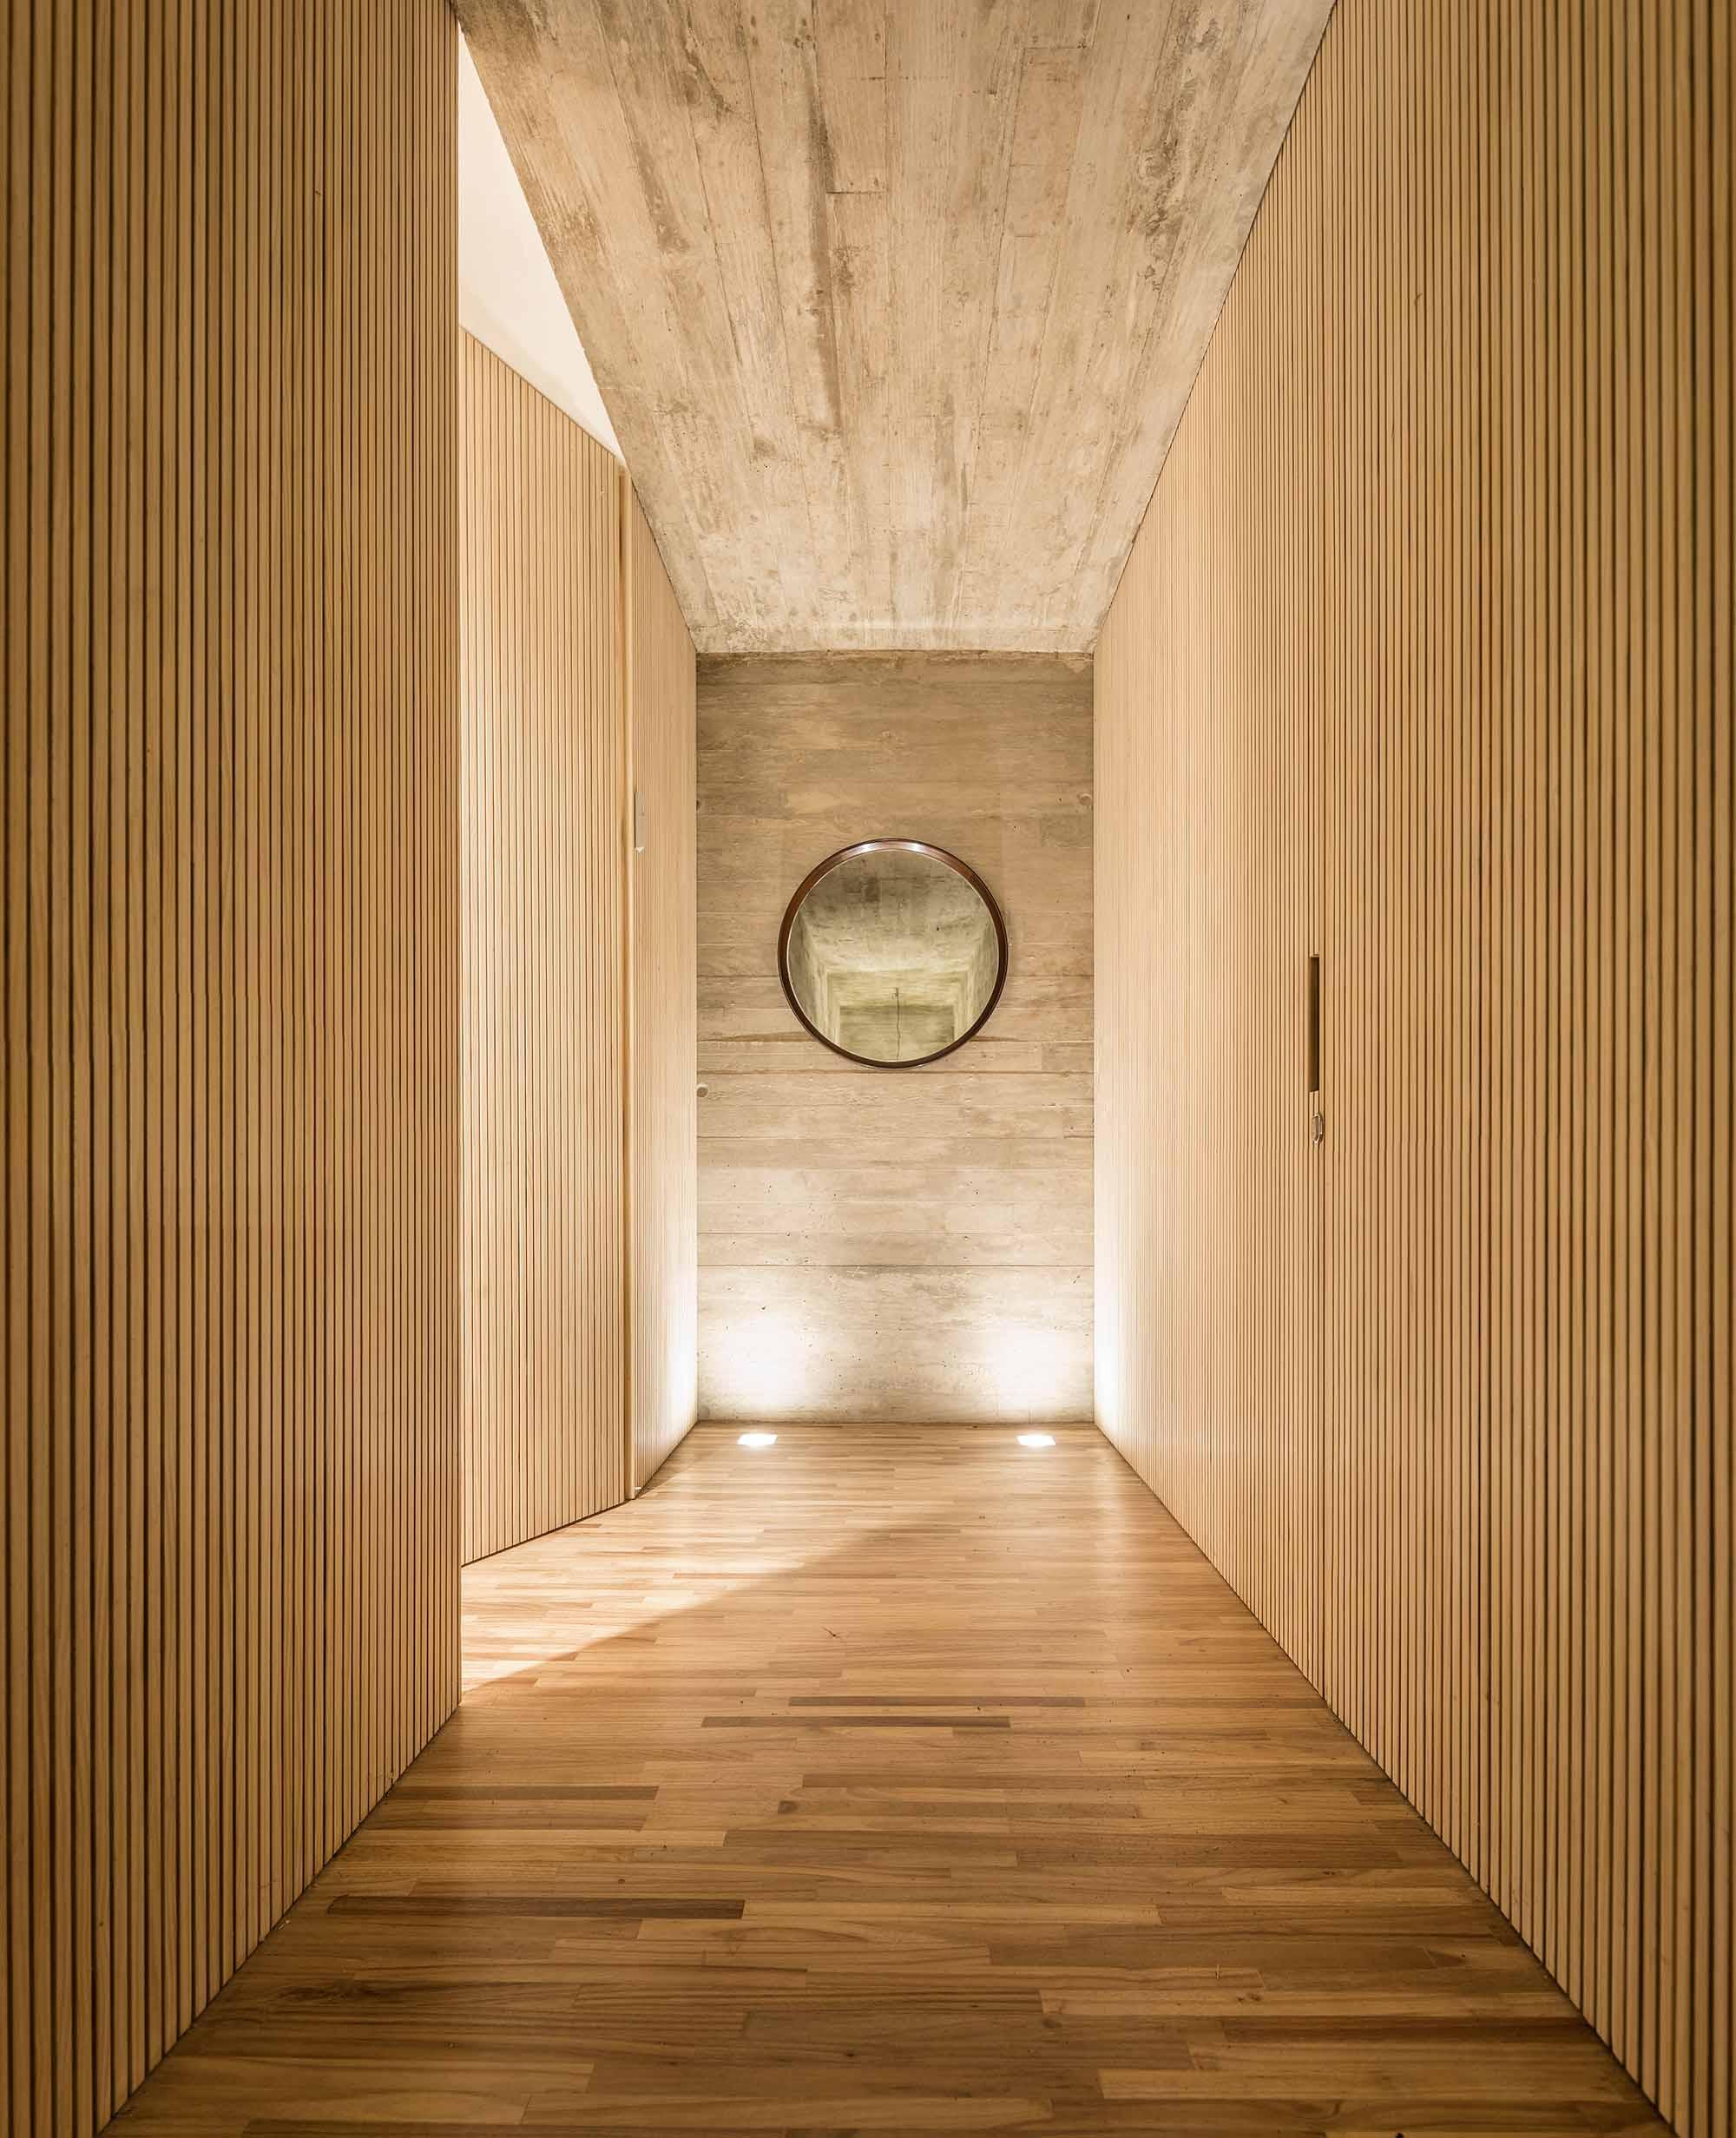 H-House-Life-Jungle-House-Casa-Da-Mata-studio-mk27-mk27_namata_fernandoguerra_medium(18).JPG